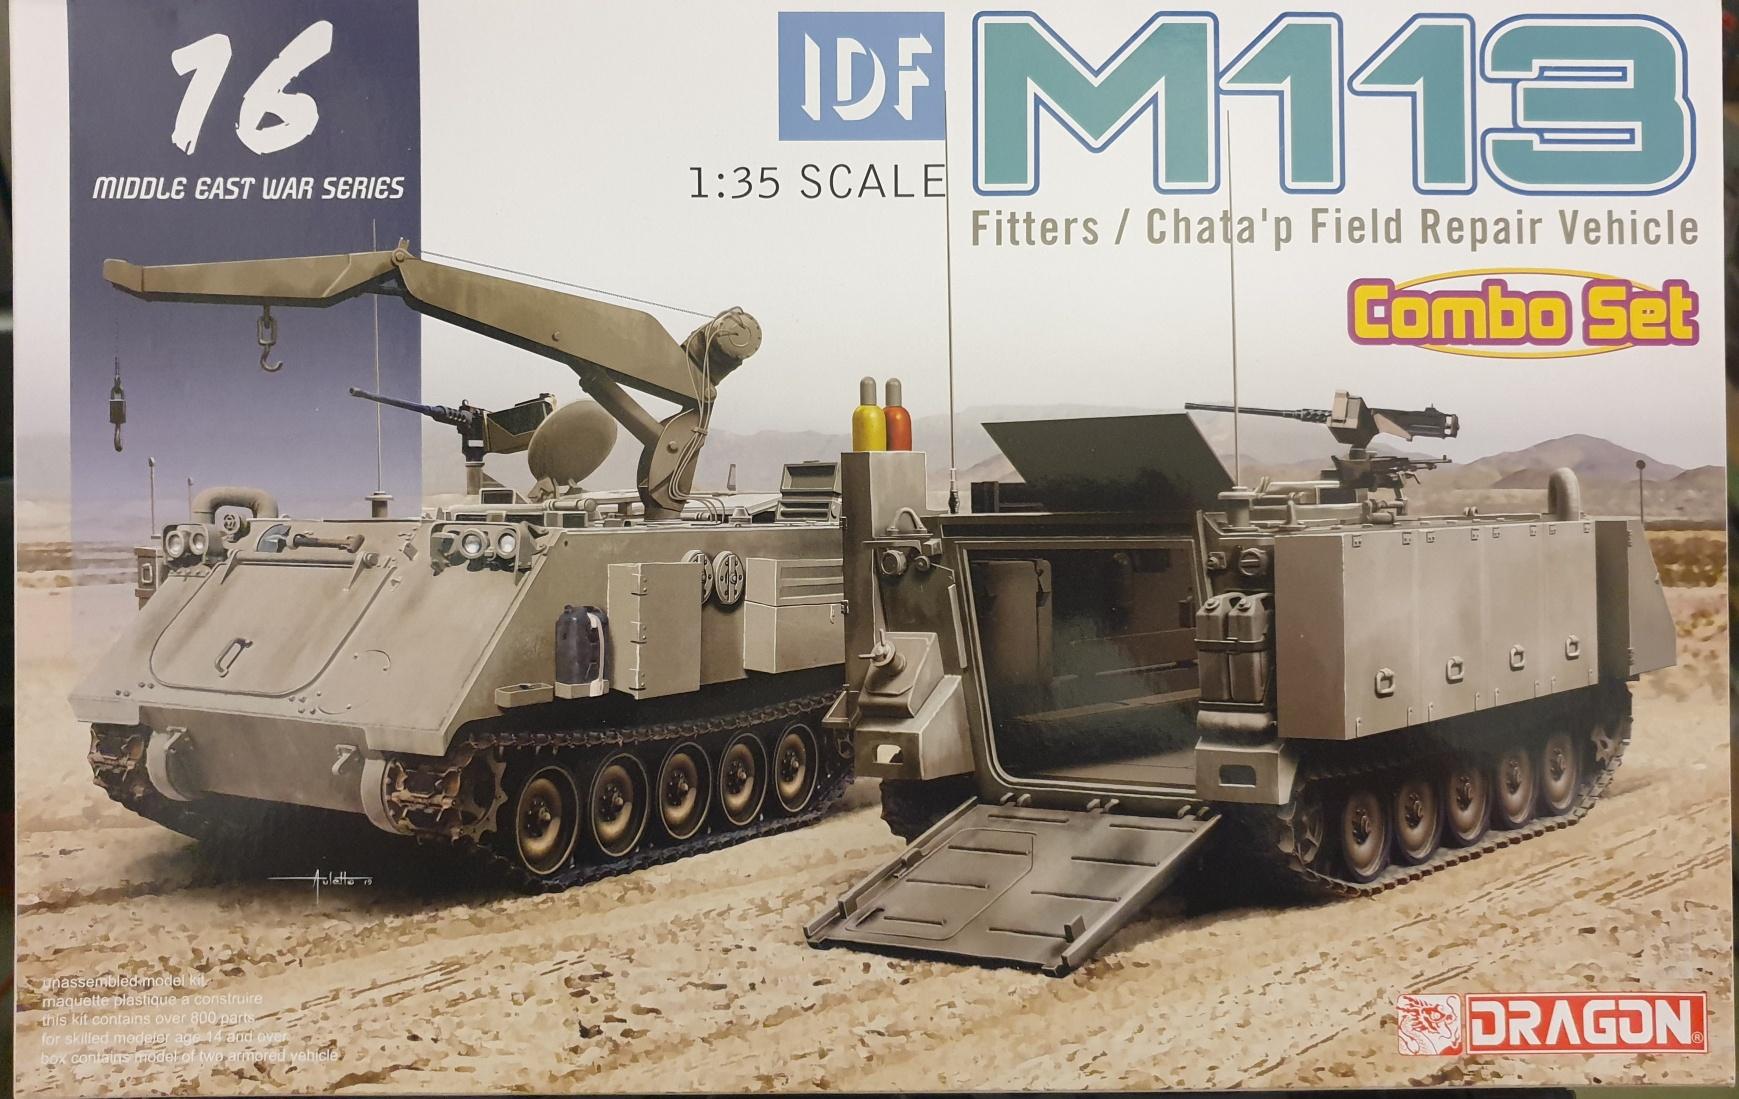 Dragon 3622 IDF M113 Fitters / Chata'p Field Repair Vehicle Combo Set 1/35